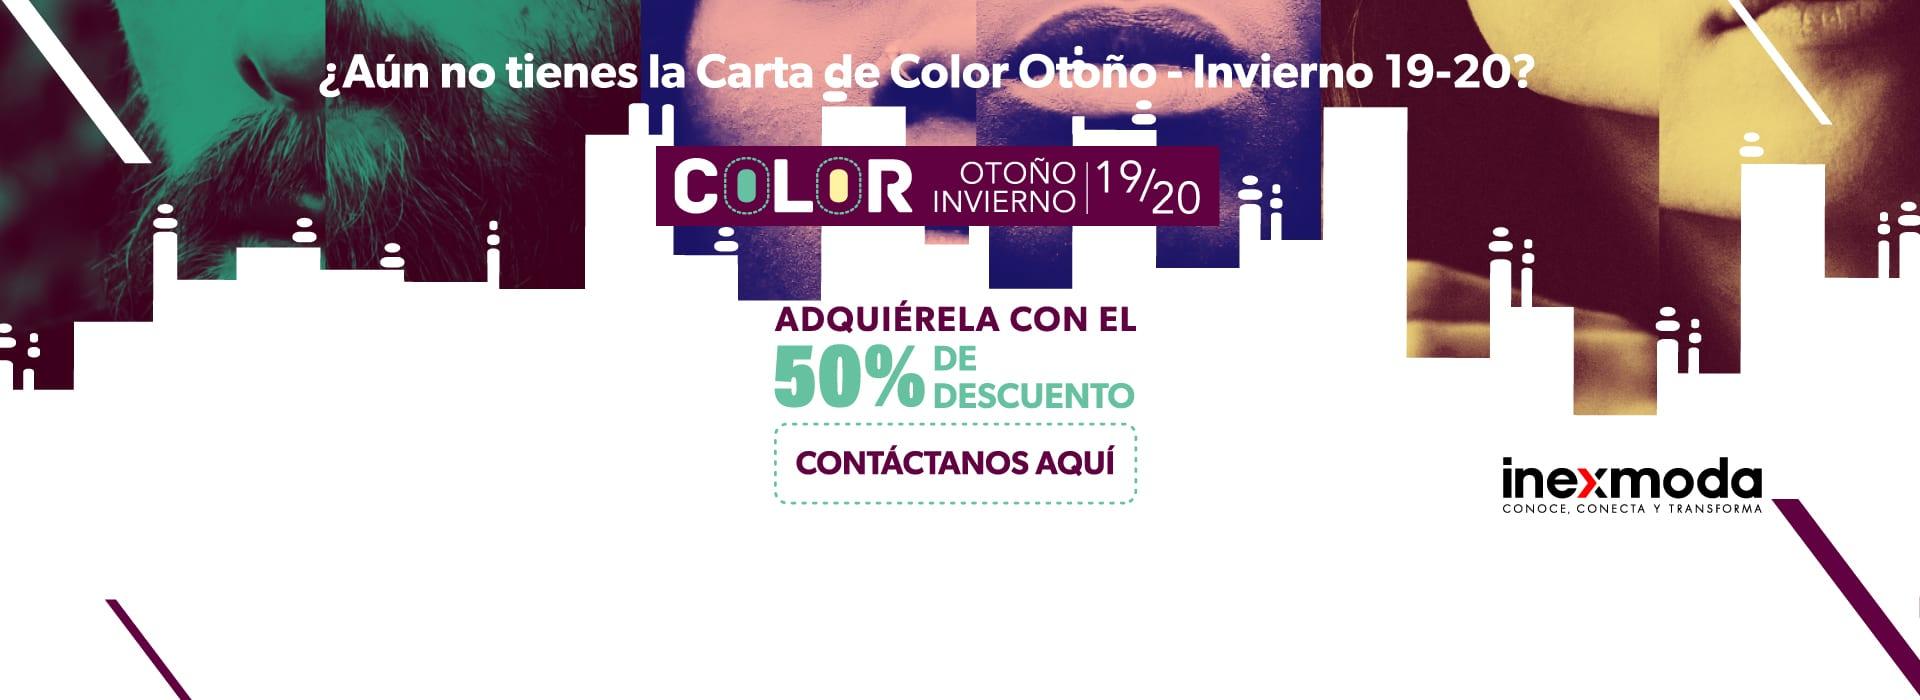 carta de color 10 - 20 inexmoda